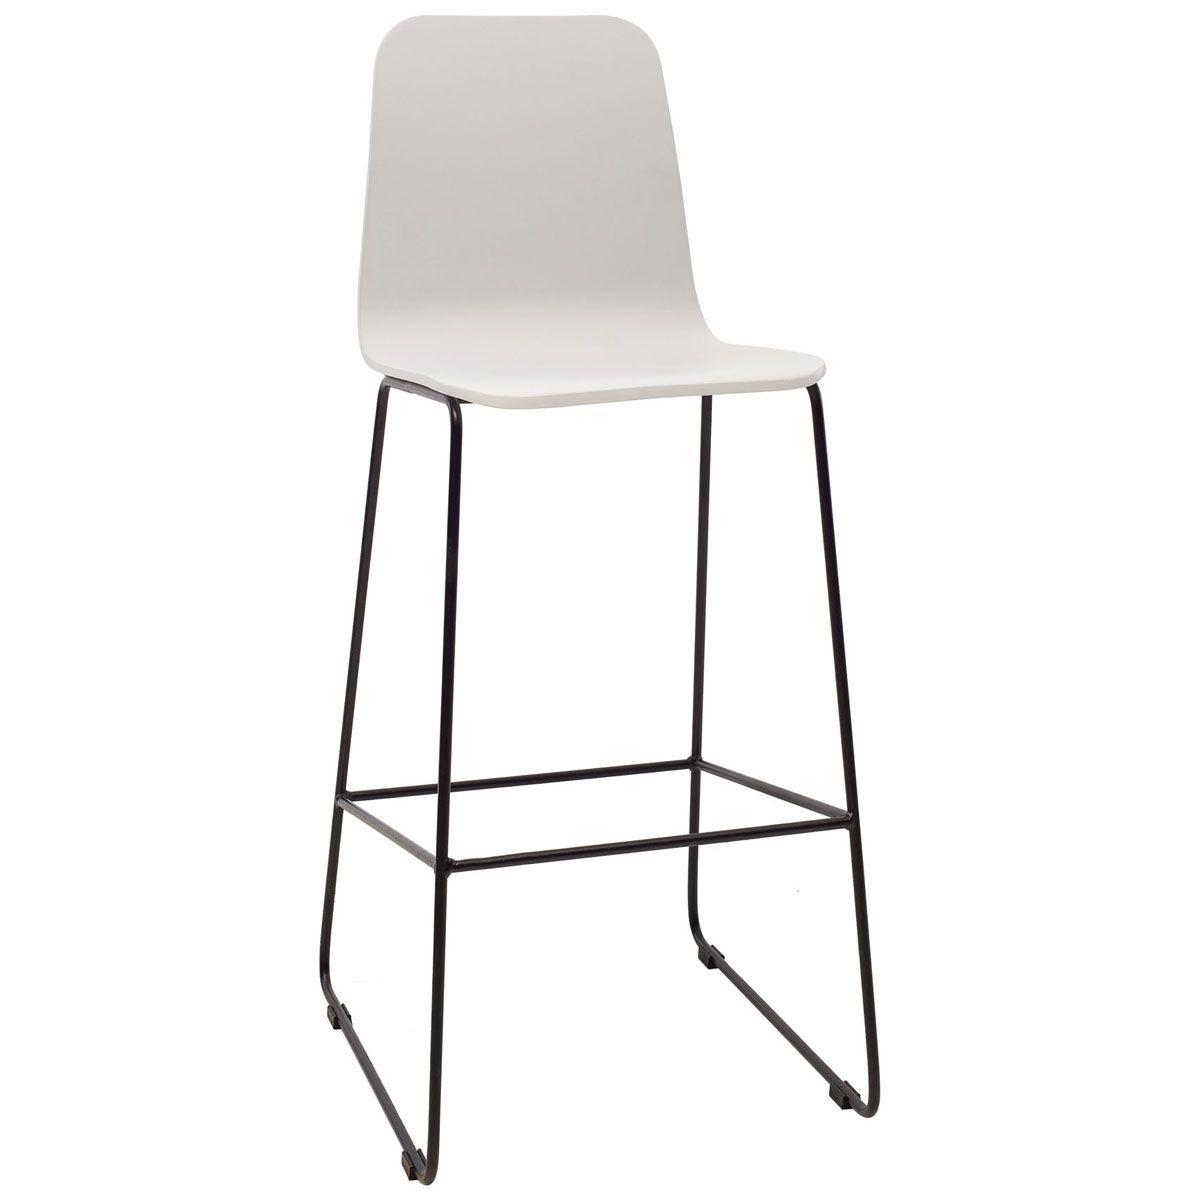 Groovy Agnes High Back Barstool Oak Hills Modern Bar Stools Gamerscity Chair Design For Home Gamerscityorg